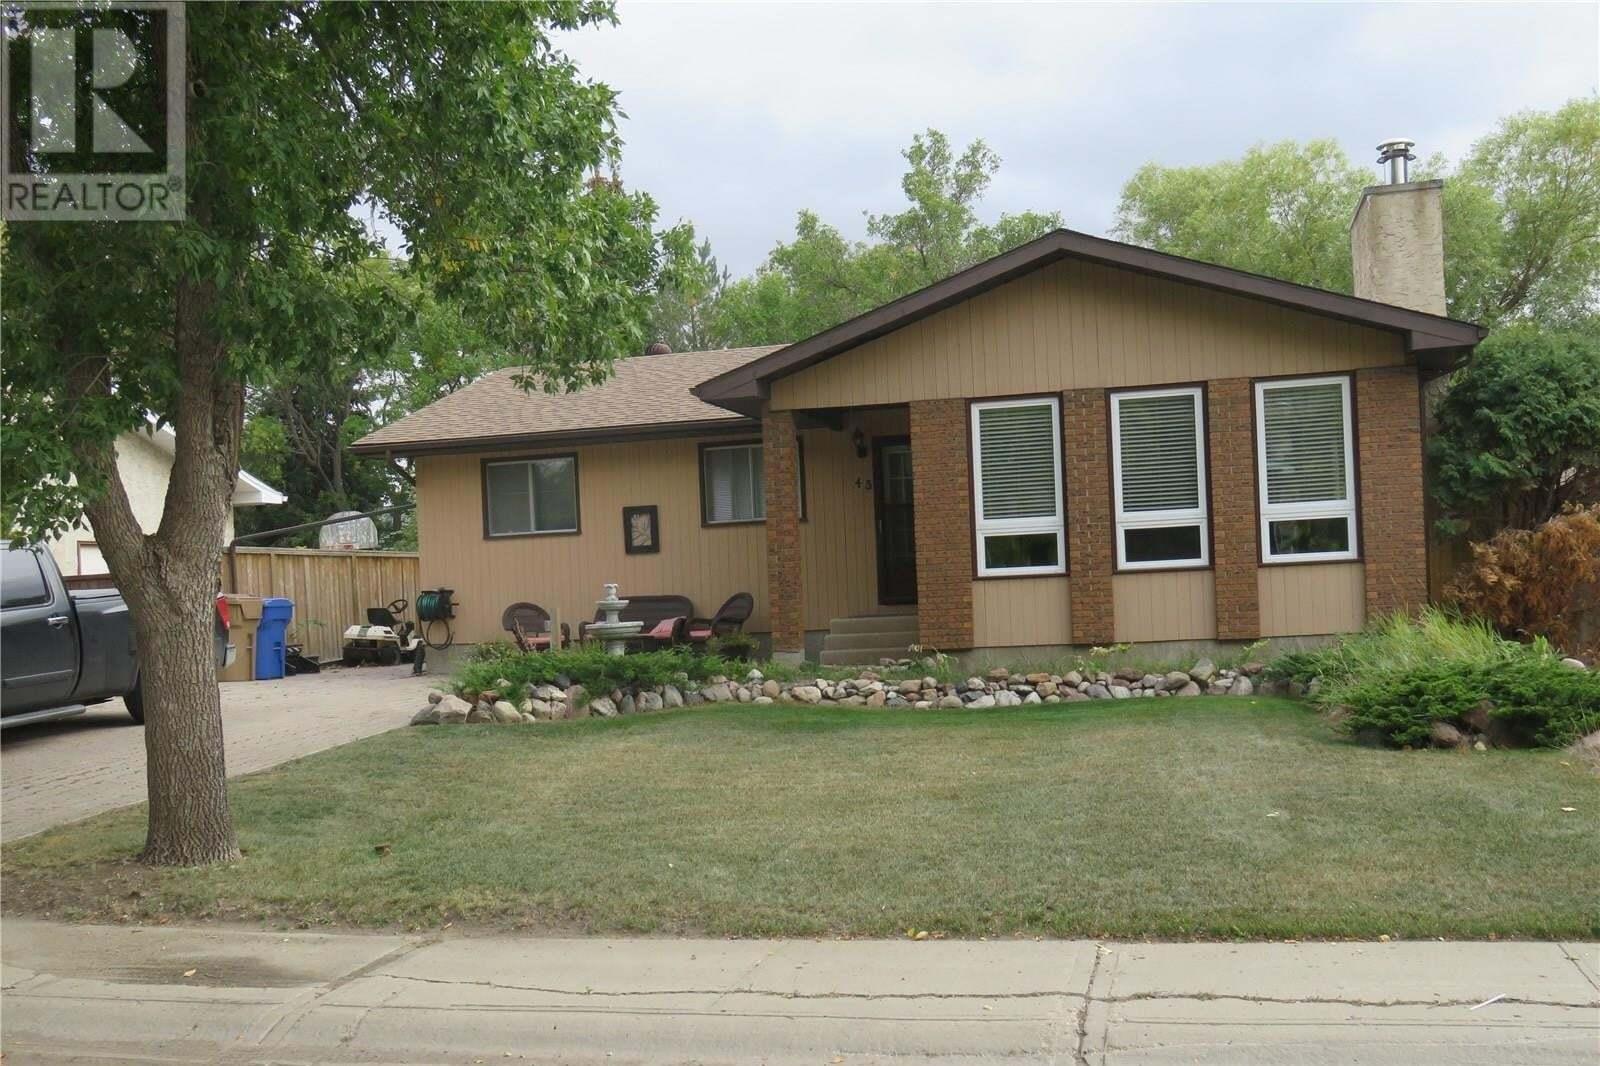 House for sale at 43 Watts By Regina Saskatchewan - MLS: SK827153